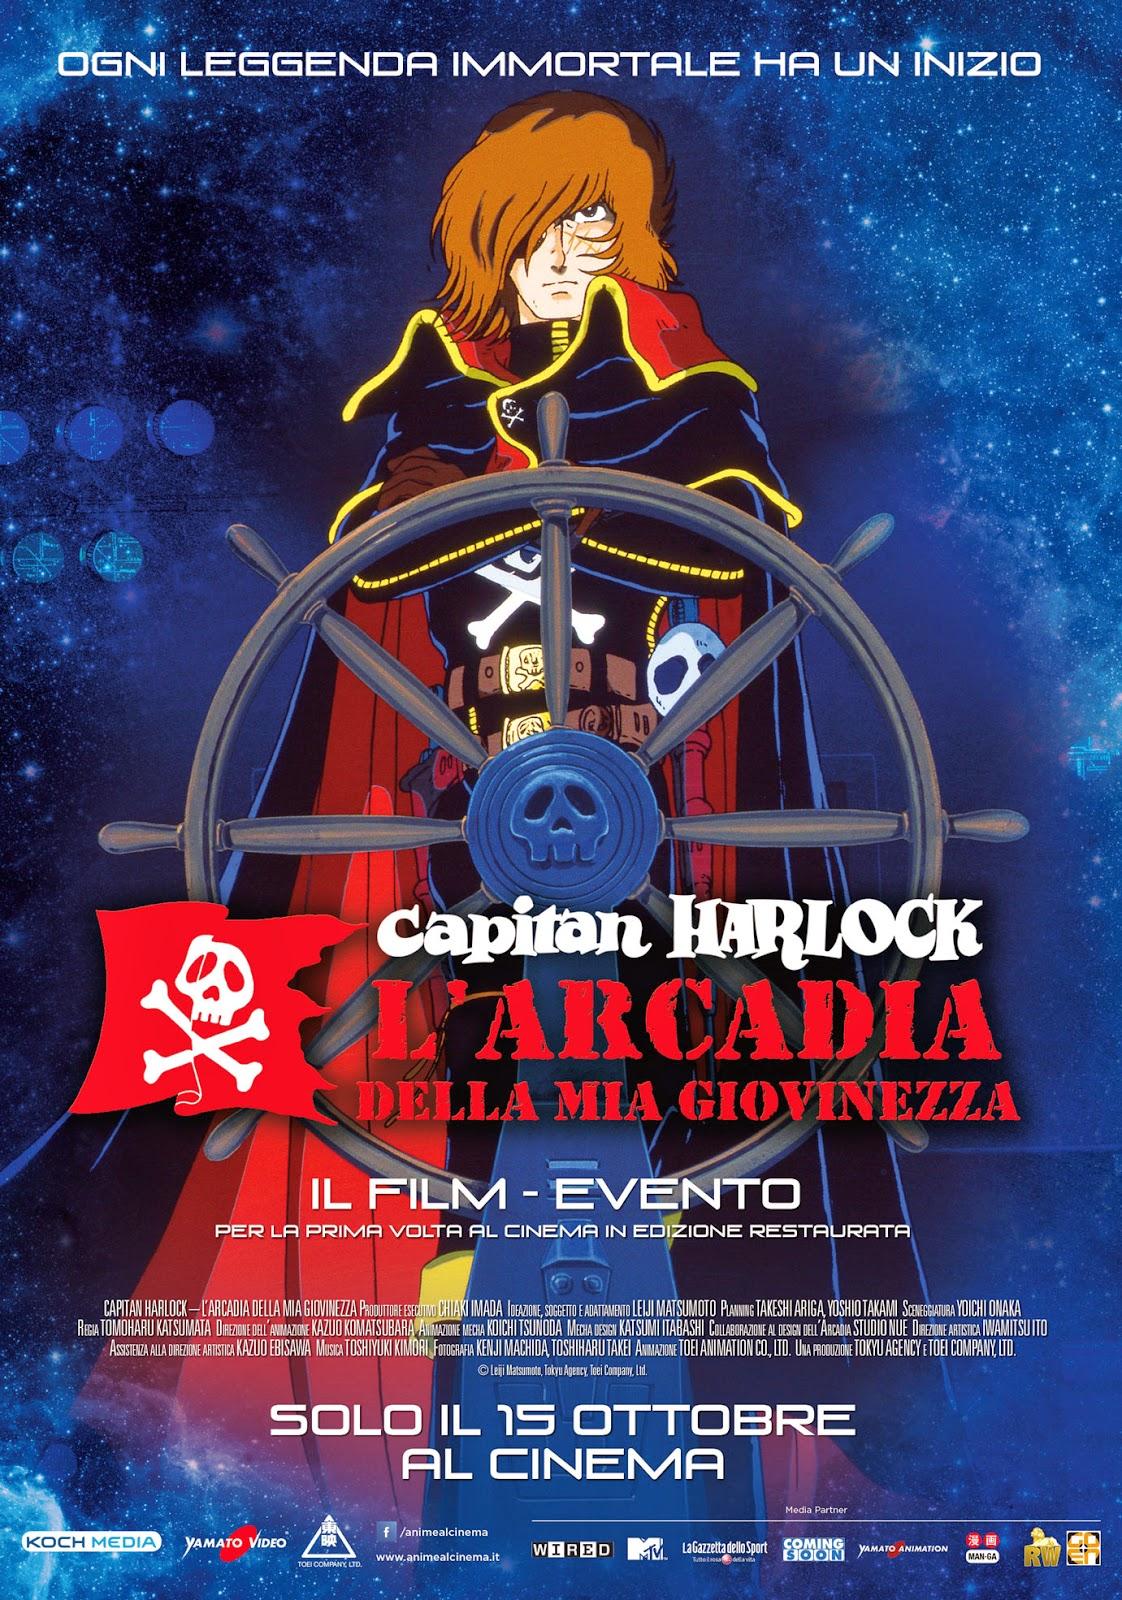 CAPITAN HARLOCK AL CINEMA IN ITALIANO, DATE, TRAILER E TRAMA - LOcandina